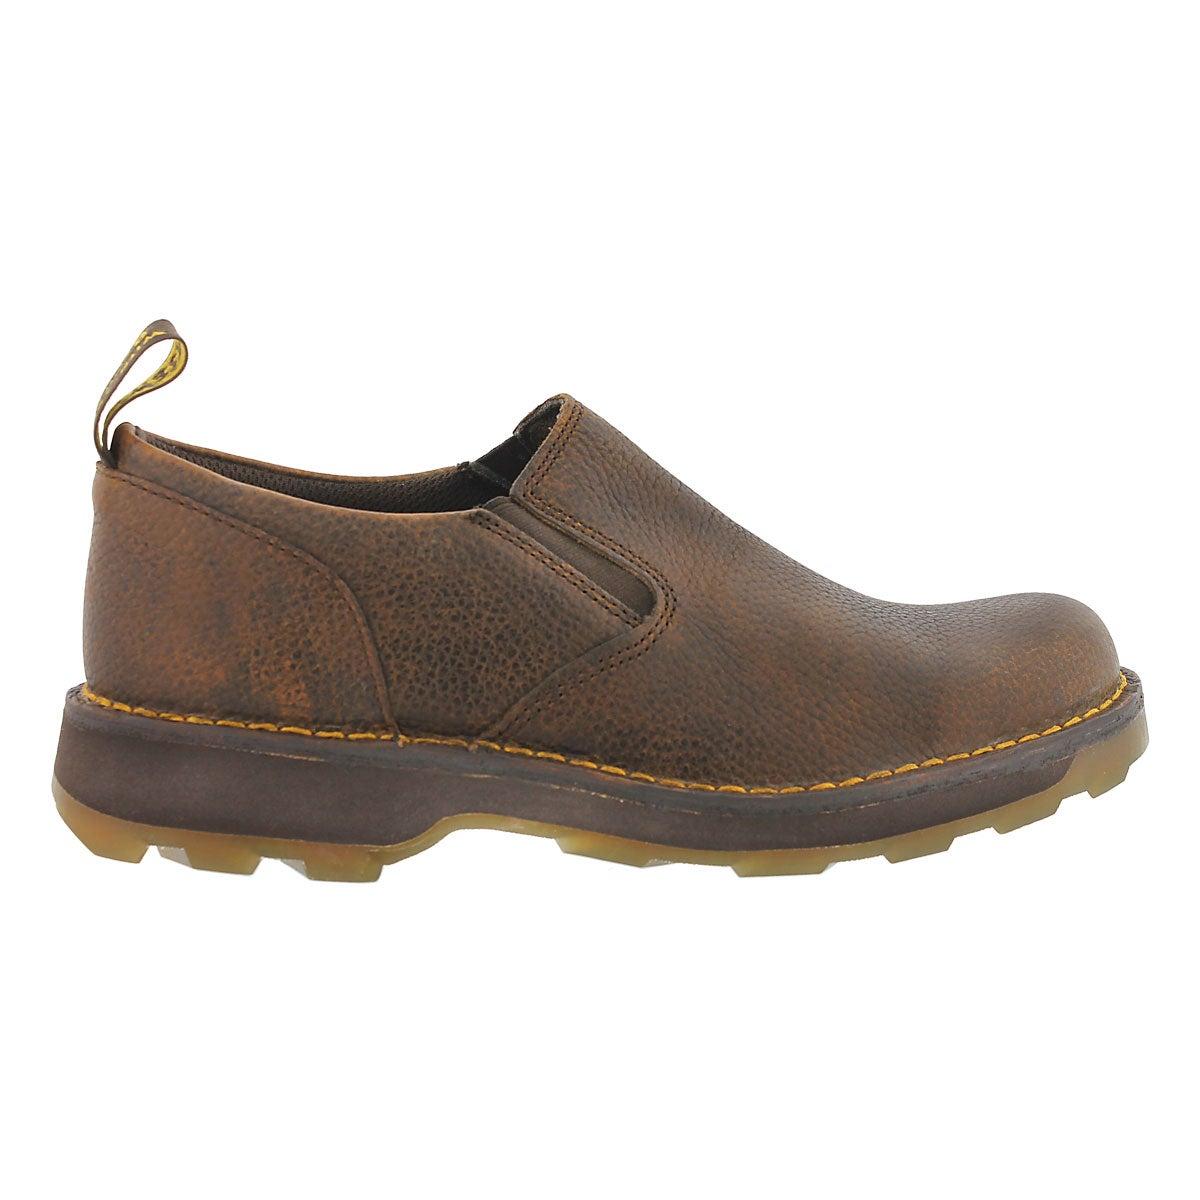 Mns Maclean sun imperial slip on shoe